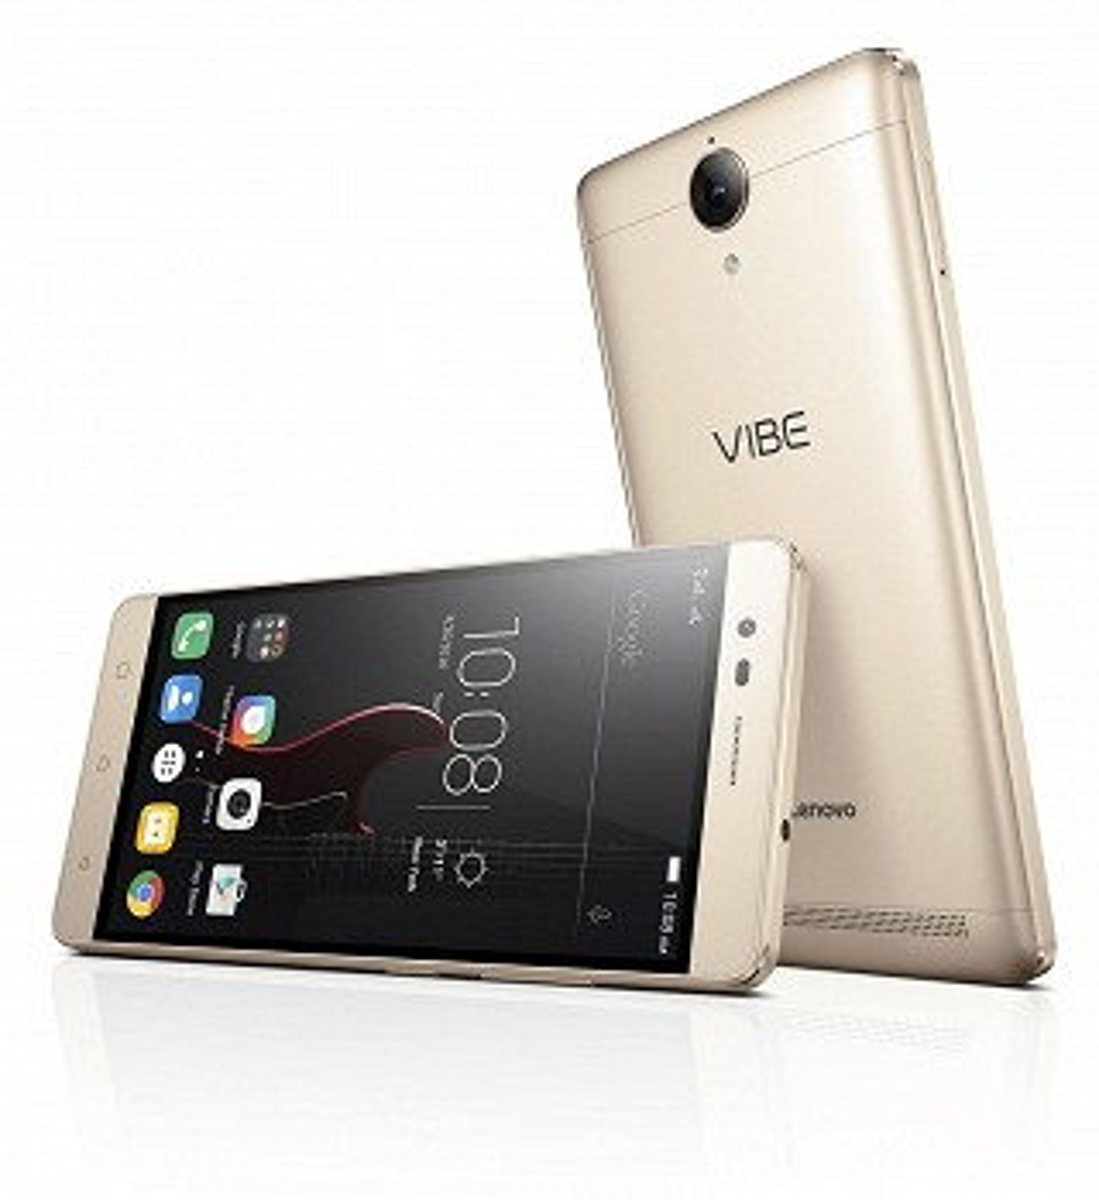 LENOVO VIBE K5 NOTE A7020A40 2SIM LTE GOLD